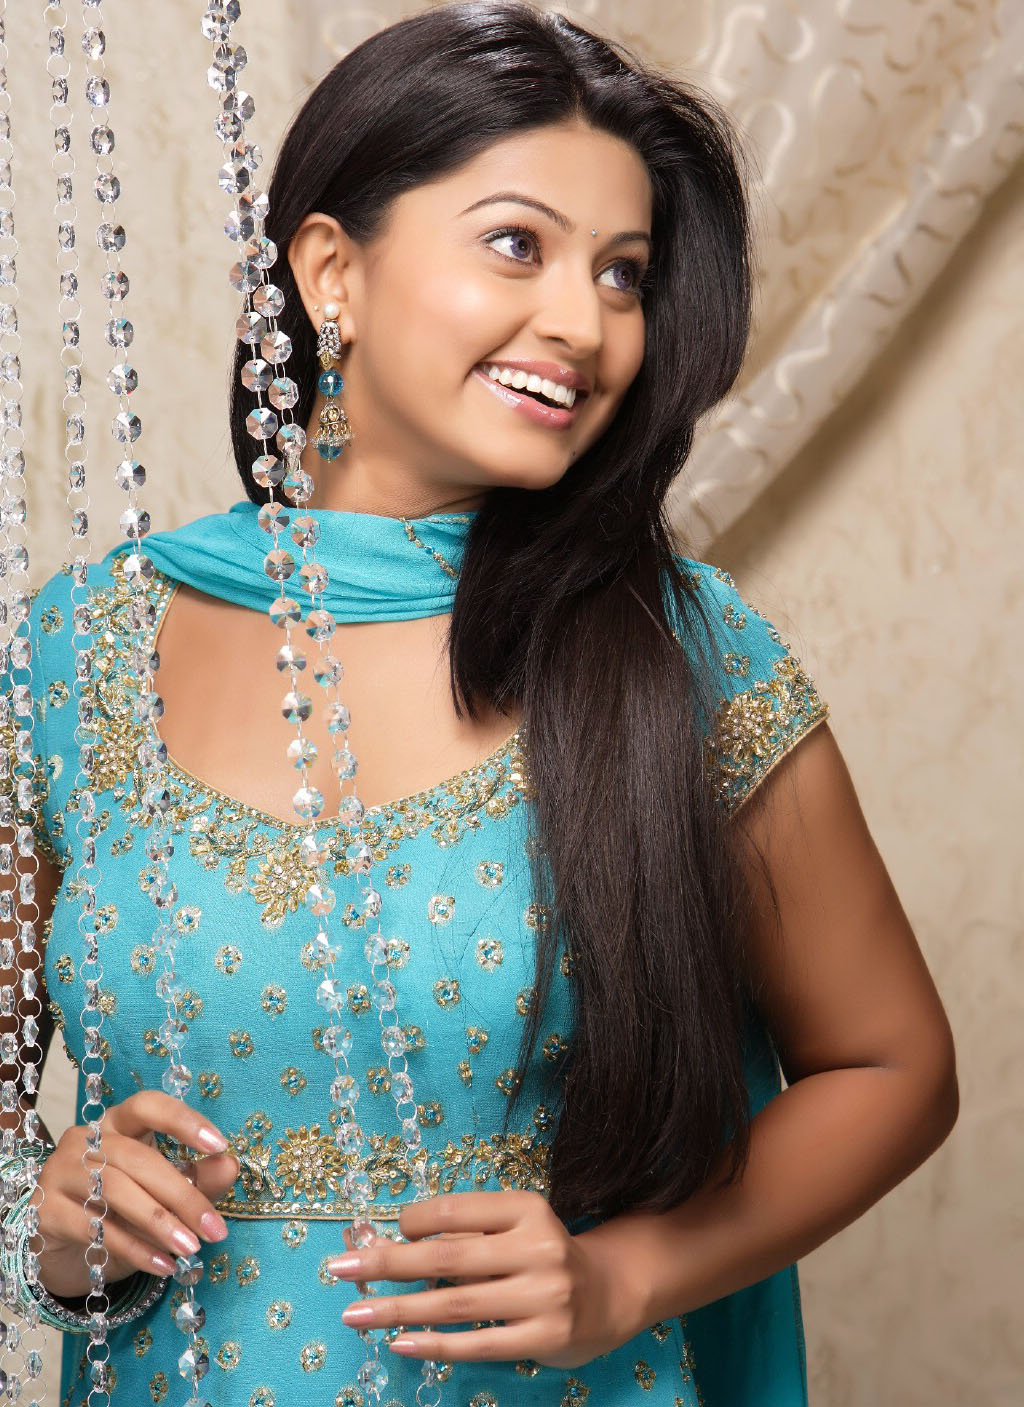 sneha actress south stills tamil indian saree suhasini viewtamilx film naidu wallpapers reddy reddys